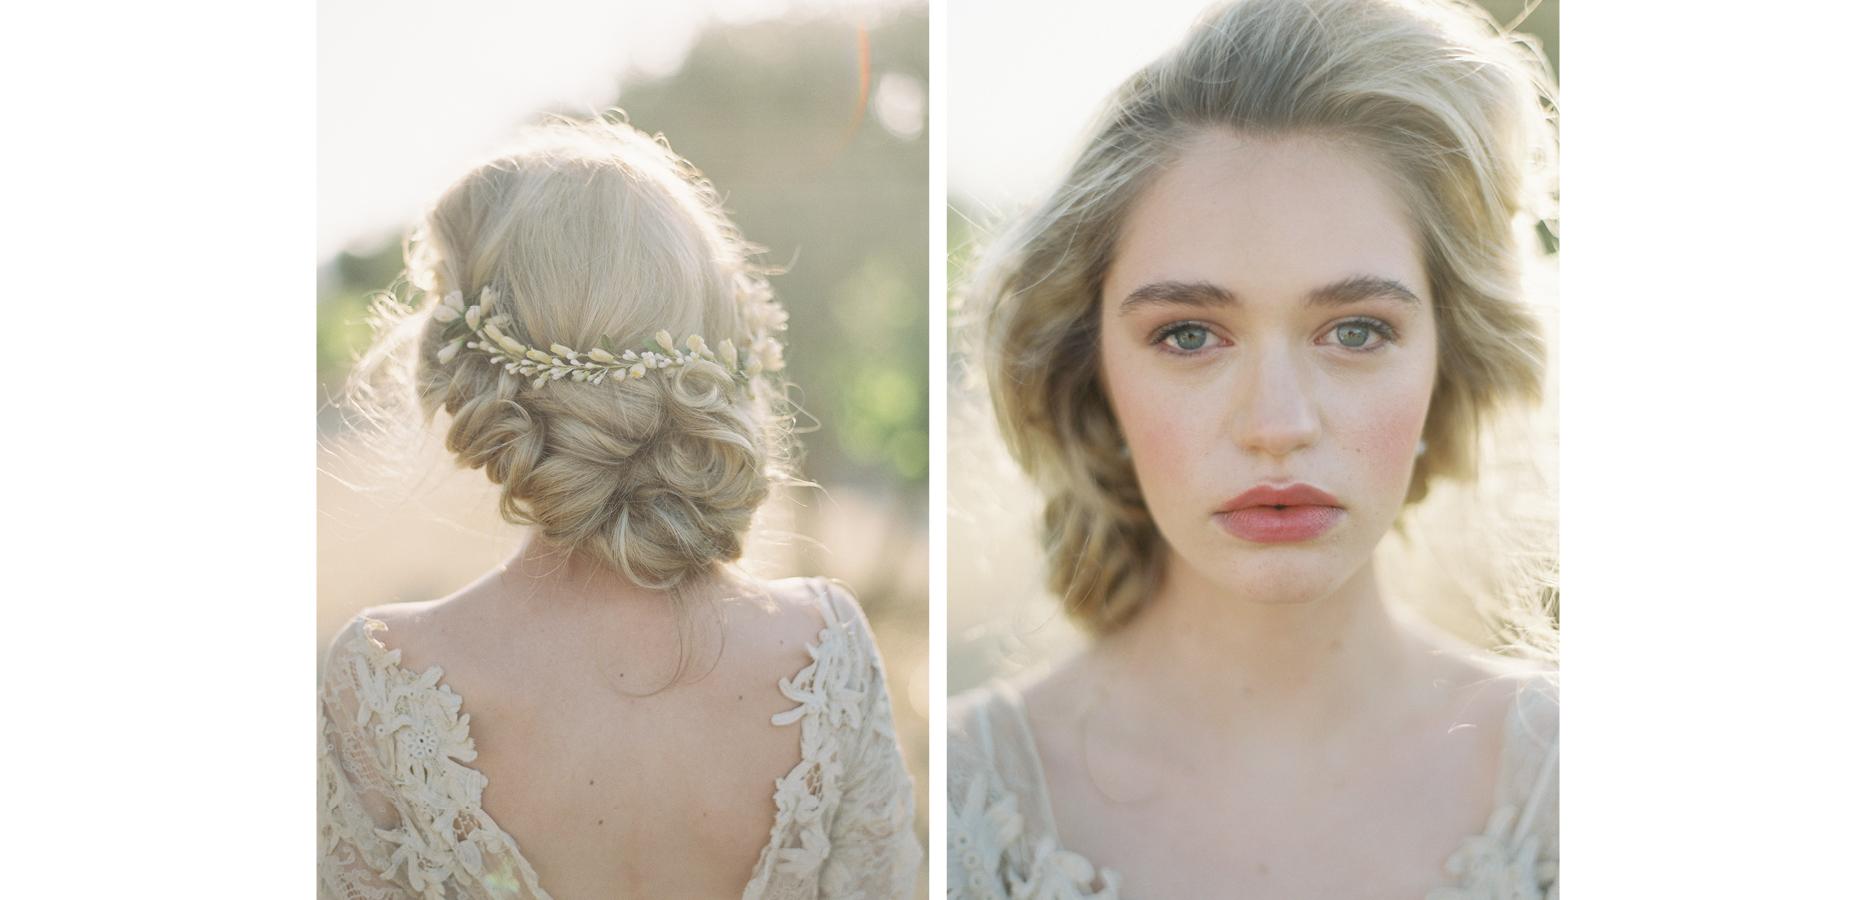 Jess-Wilcox-Hair-Makeup-Wedding_portfolio13.jpg